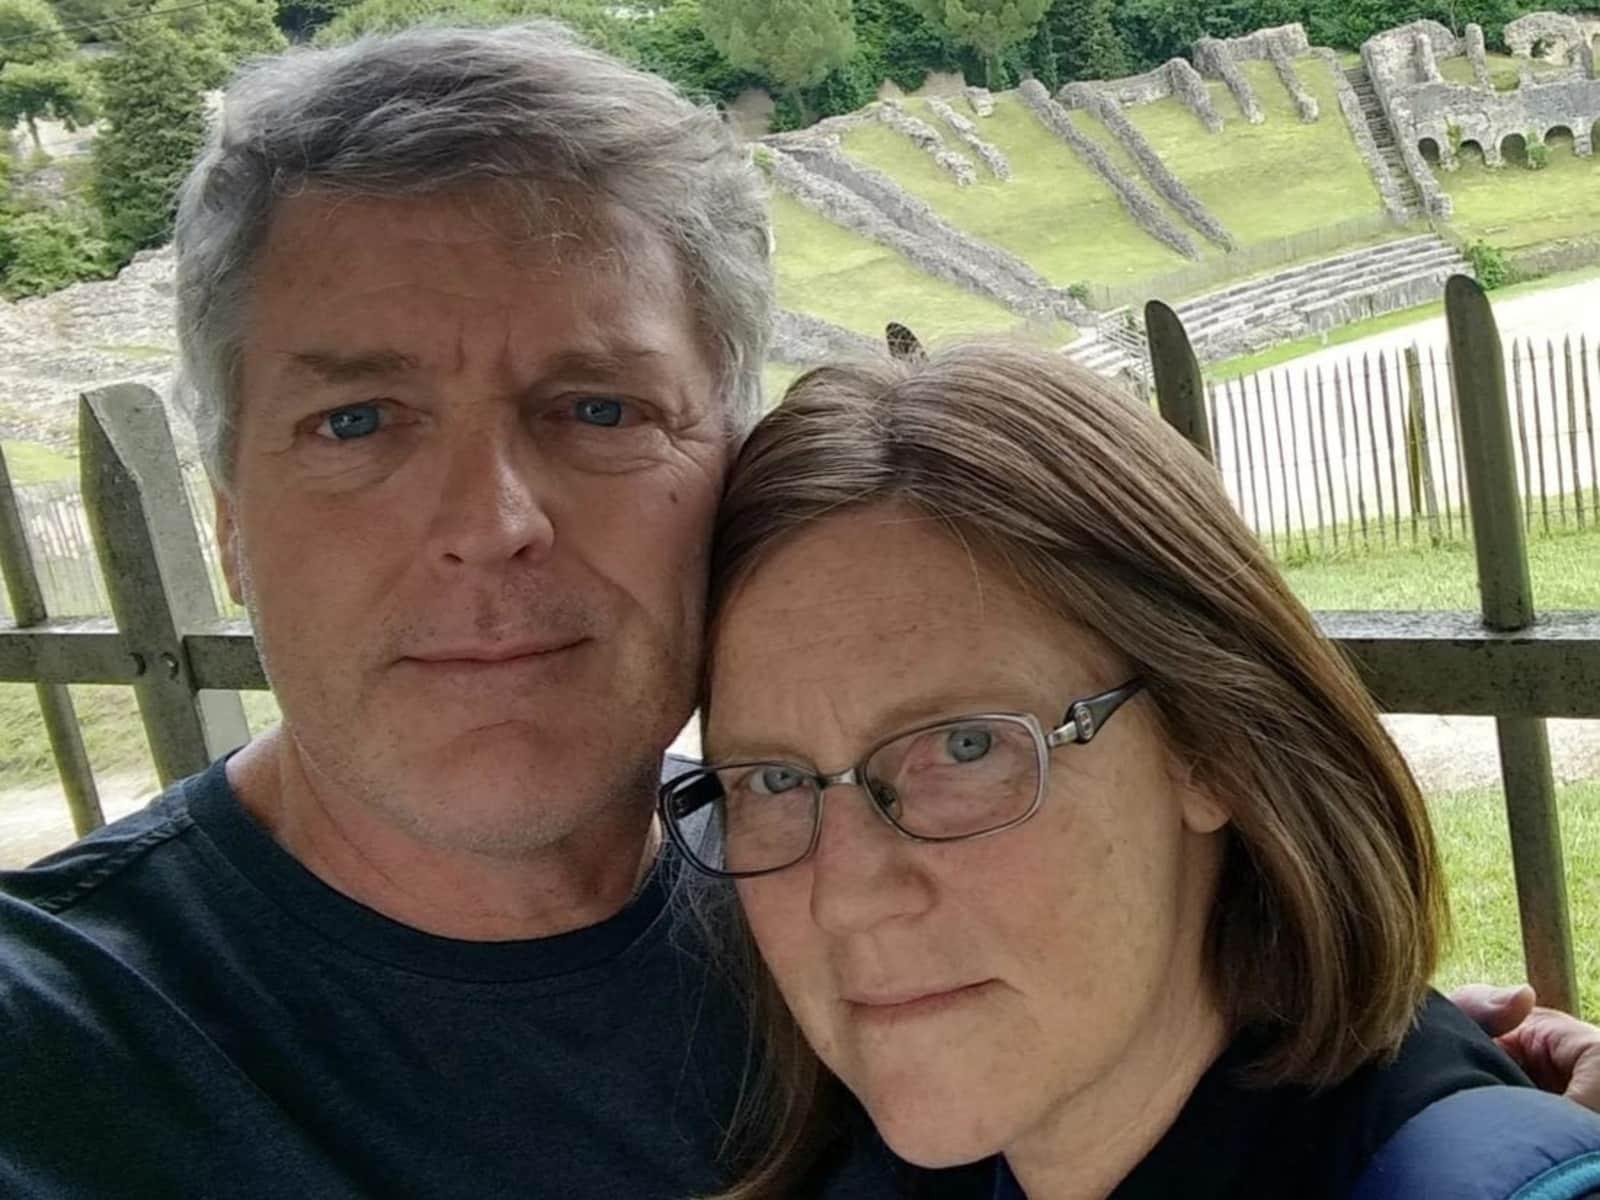 Scott & Kristin from Clinton, Washington, United States